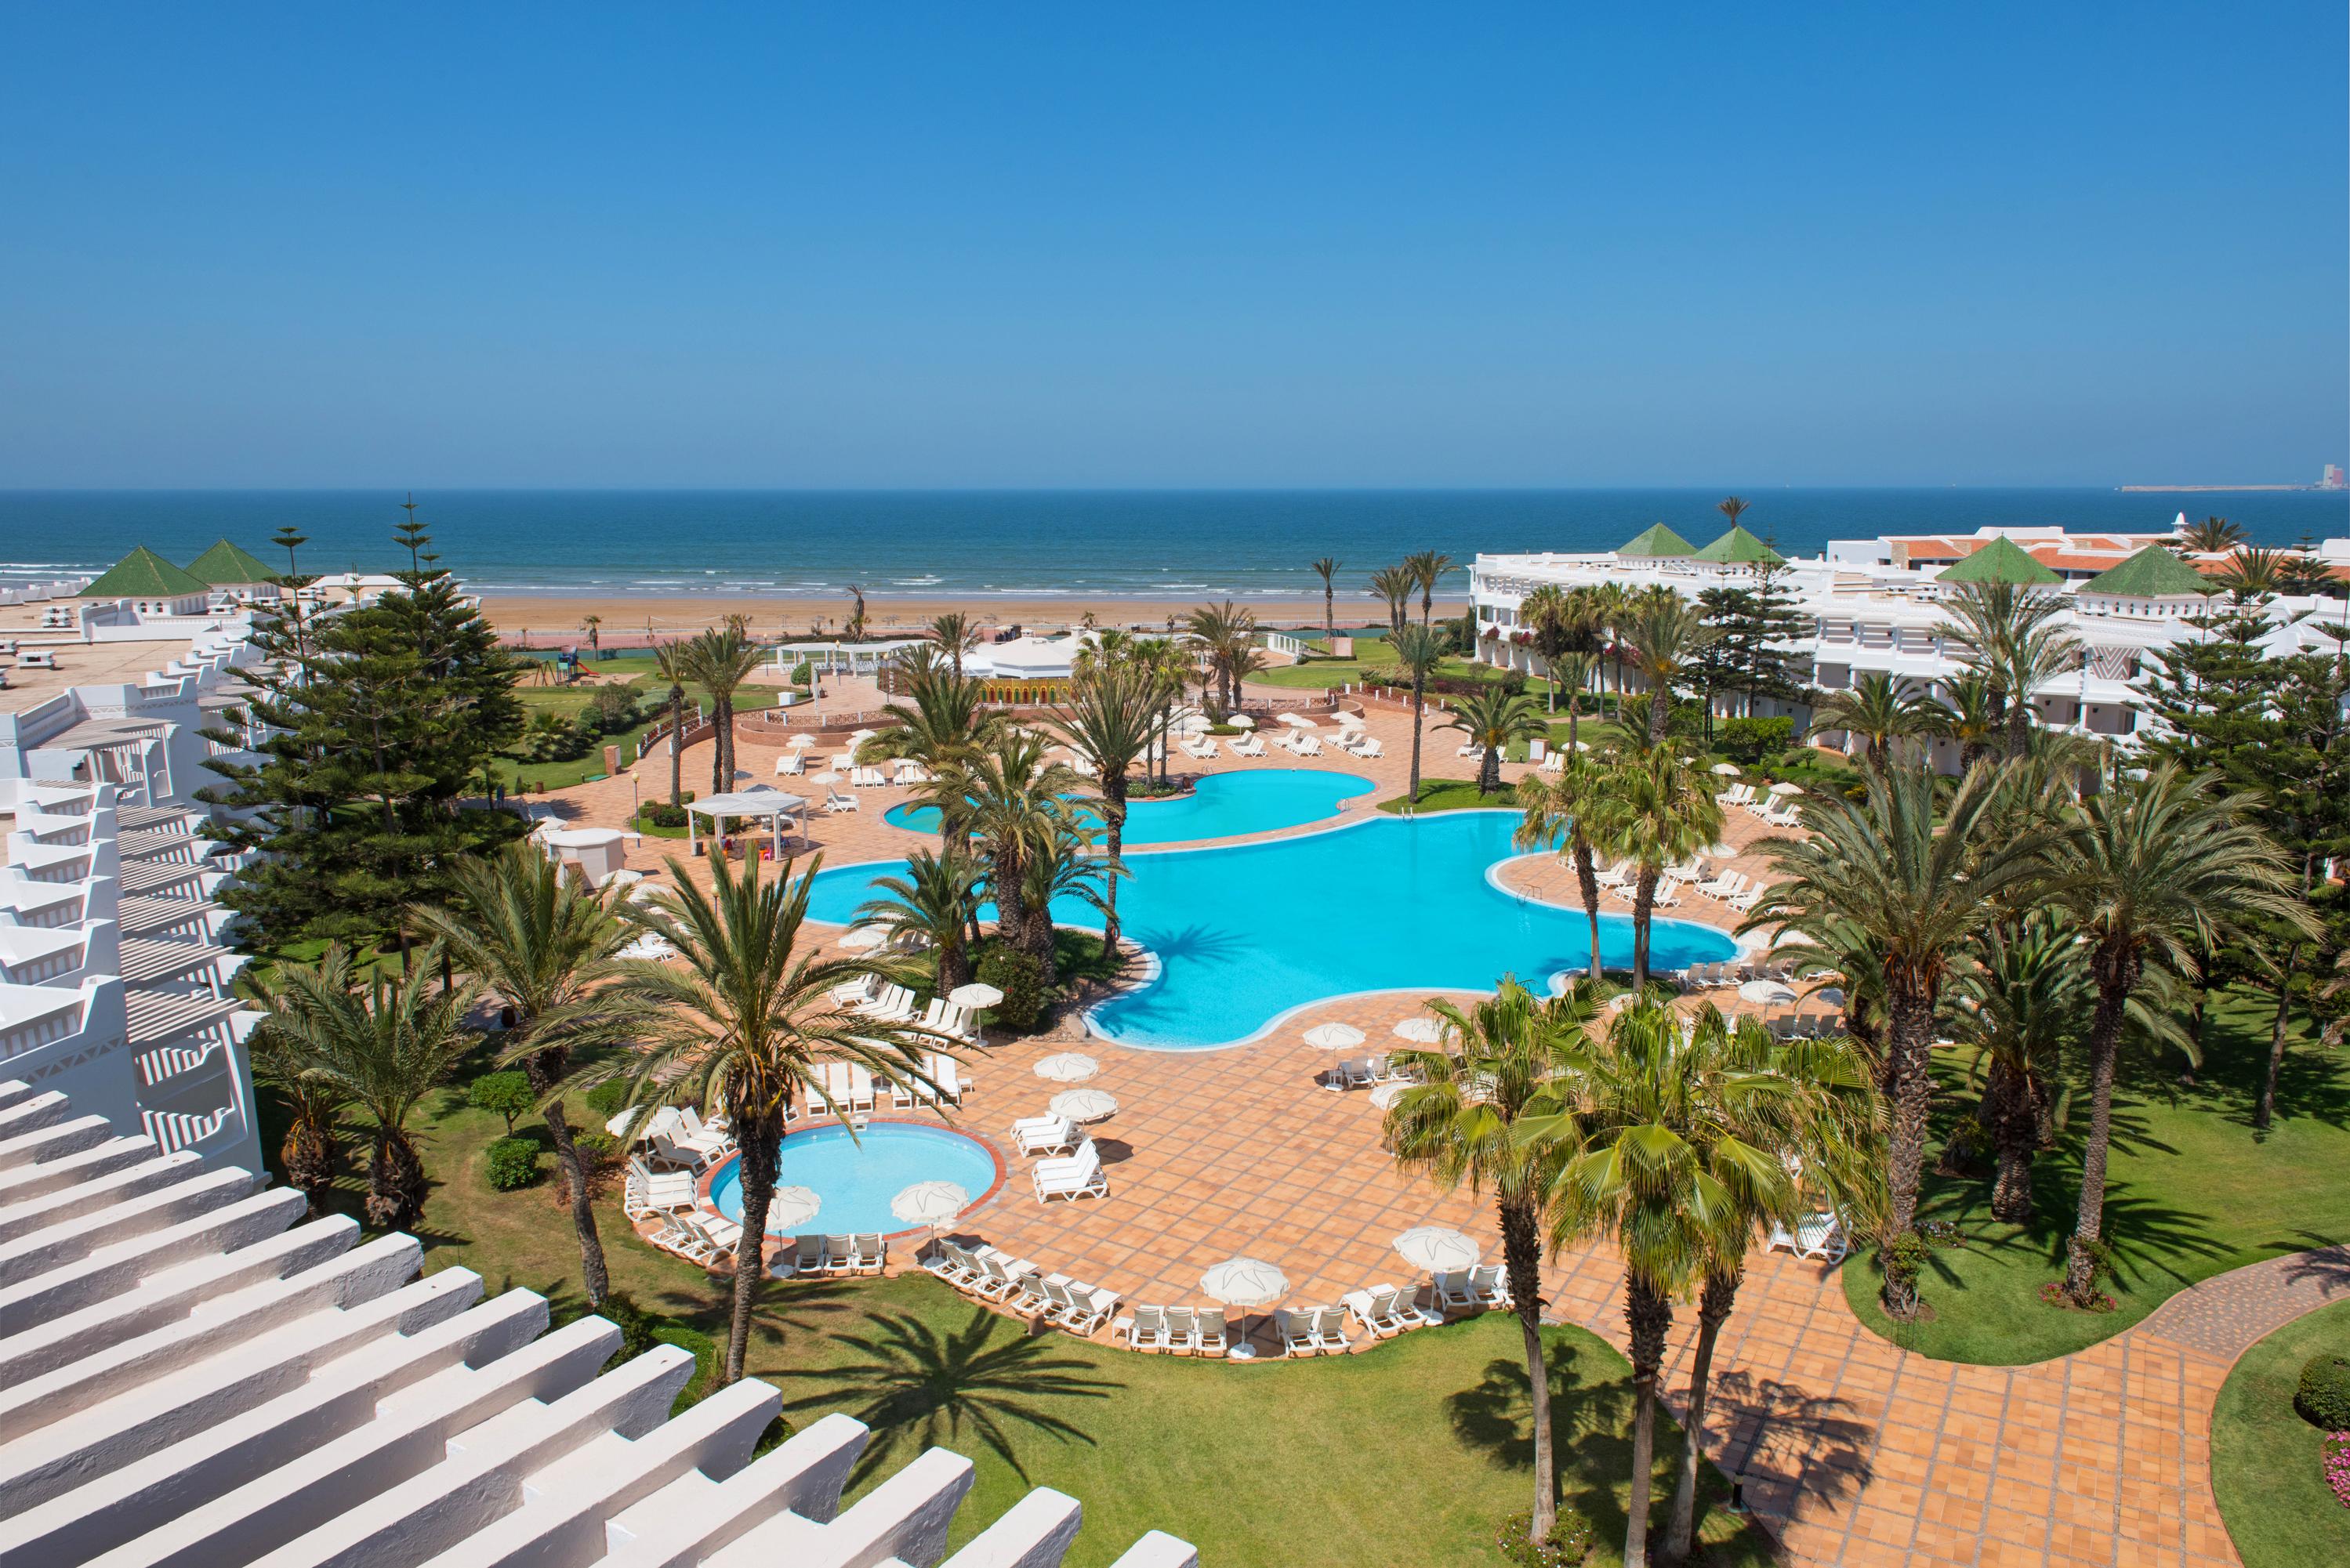 MAROKO - ZIMA 2020: Marrakesz + Agadir, 8 dni (10-17.02.2020 r.), dwa posiłki/all inclusive: 3 + 1